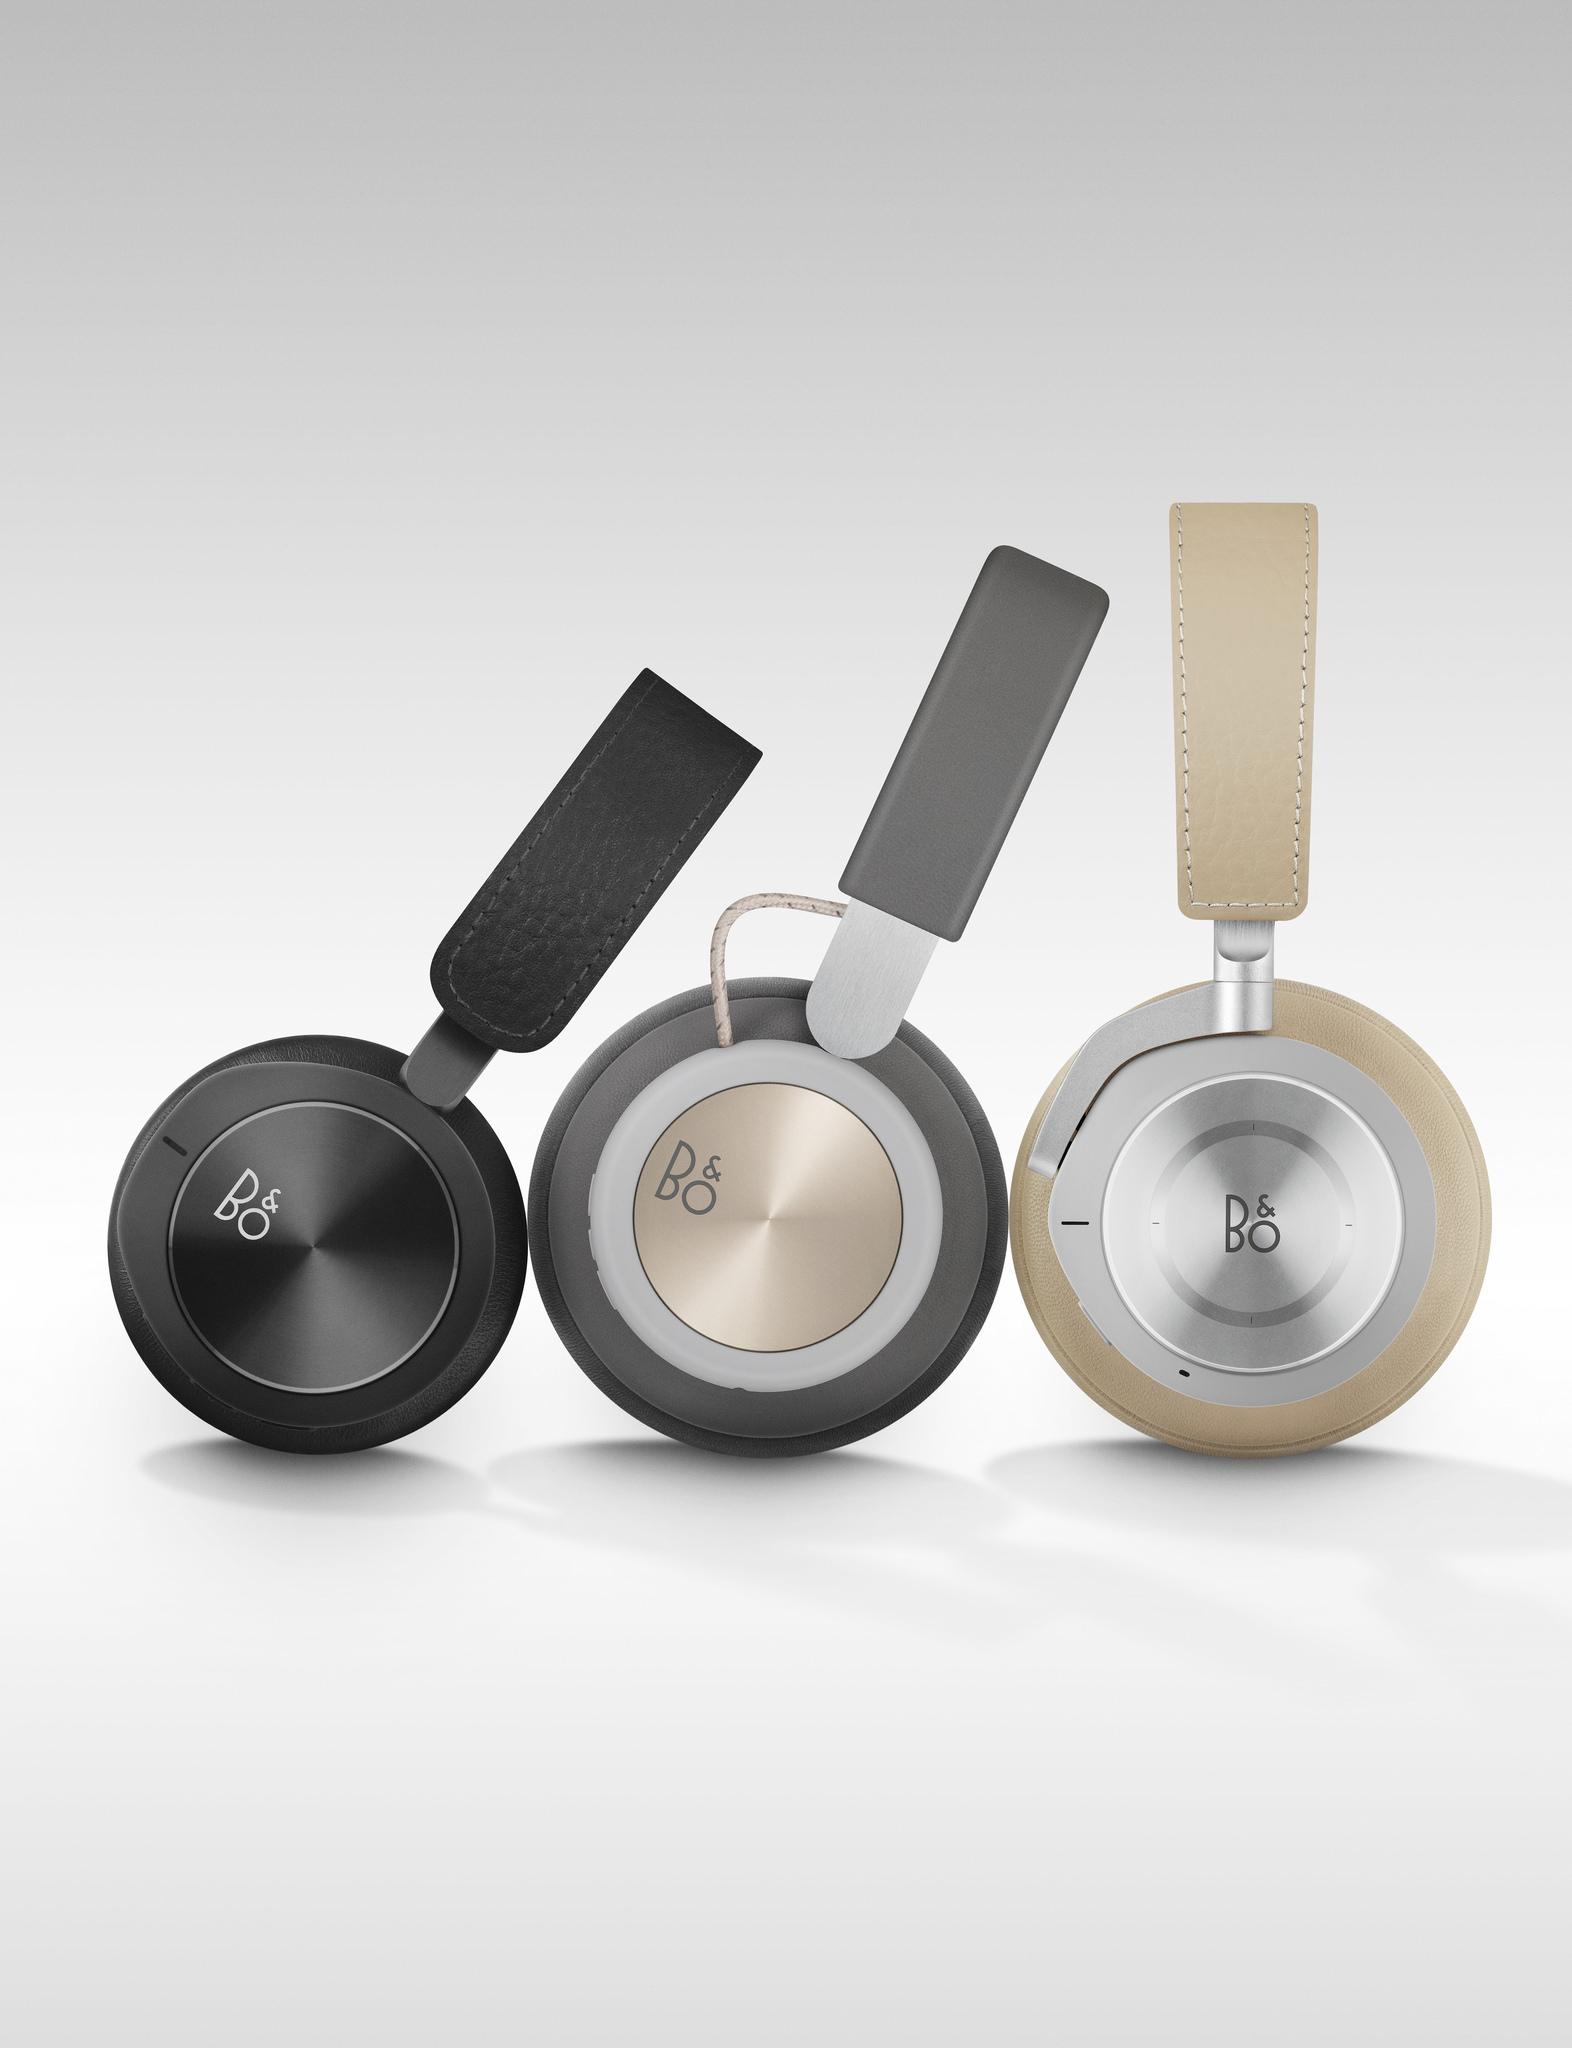 Bang & Olufsen 旗艦級頭戴式無線耳機 H8i / H9i 現身